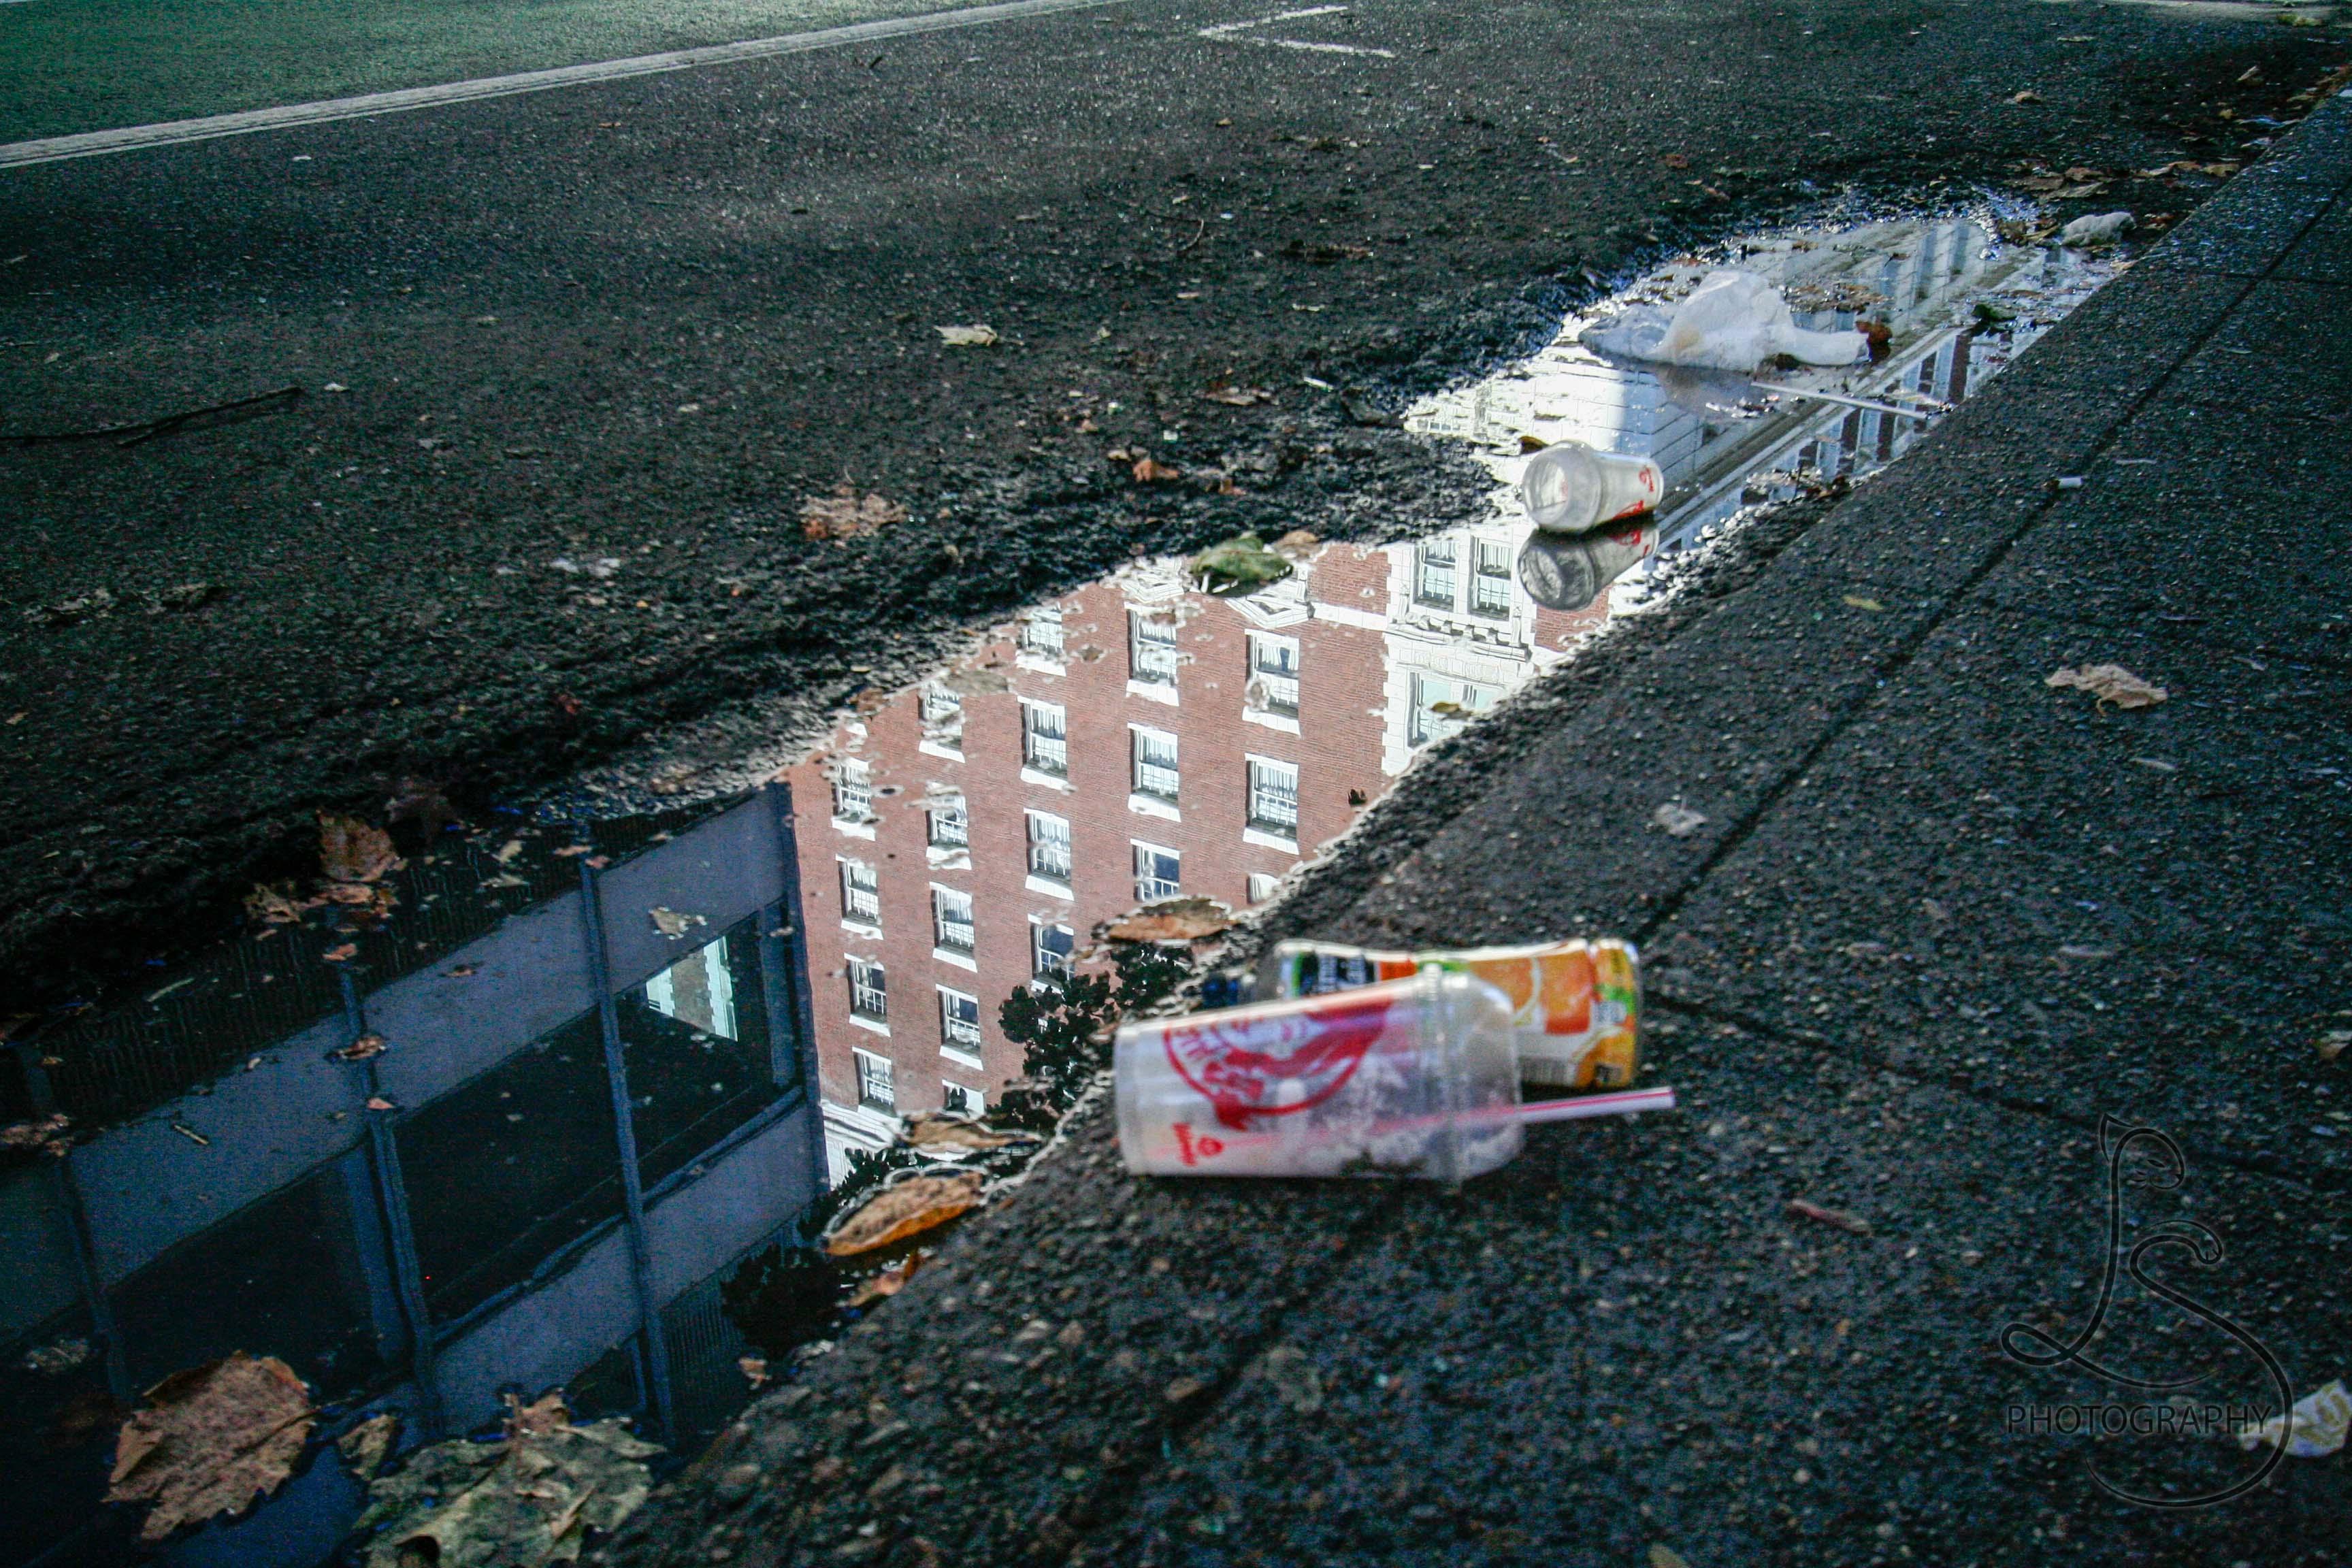 © LotsaSmiles Photography 2013